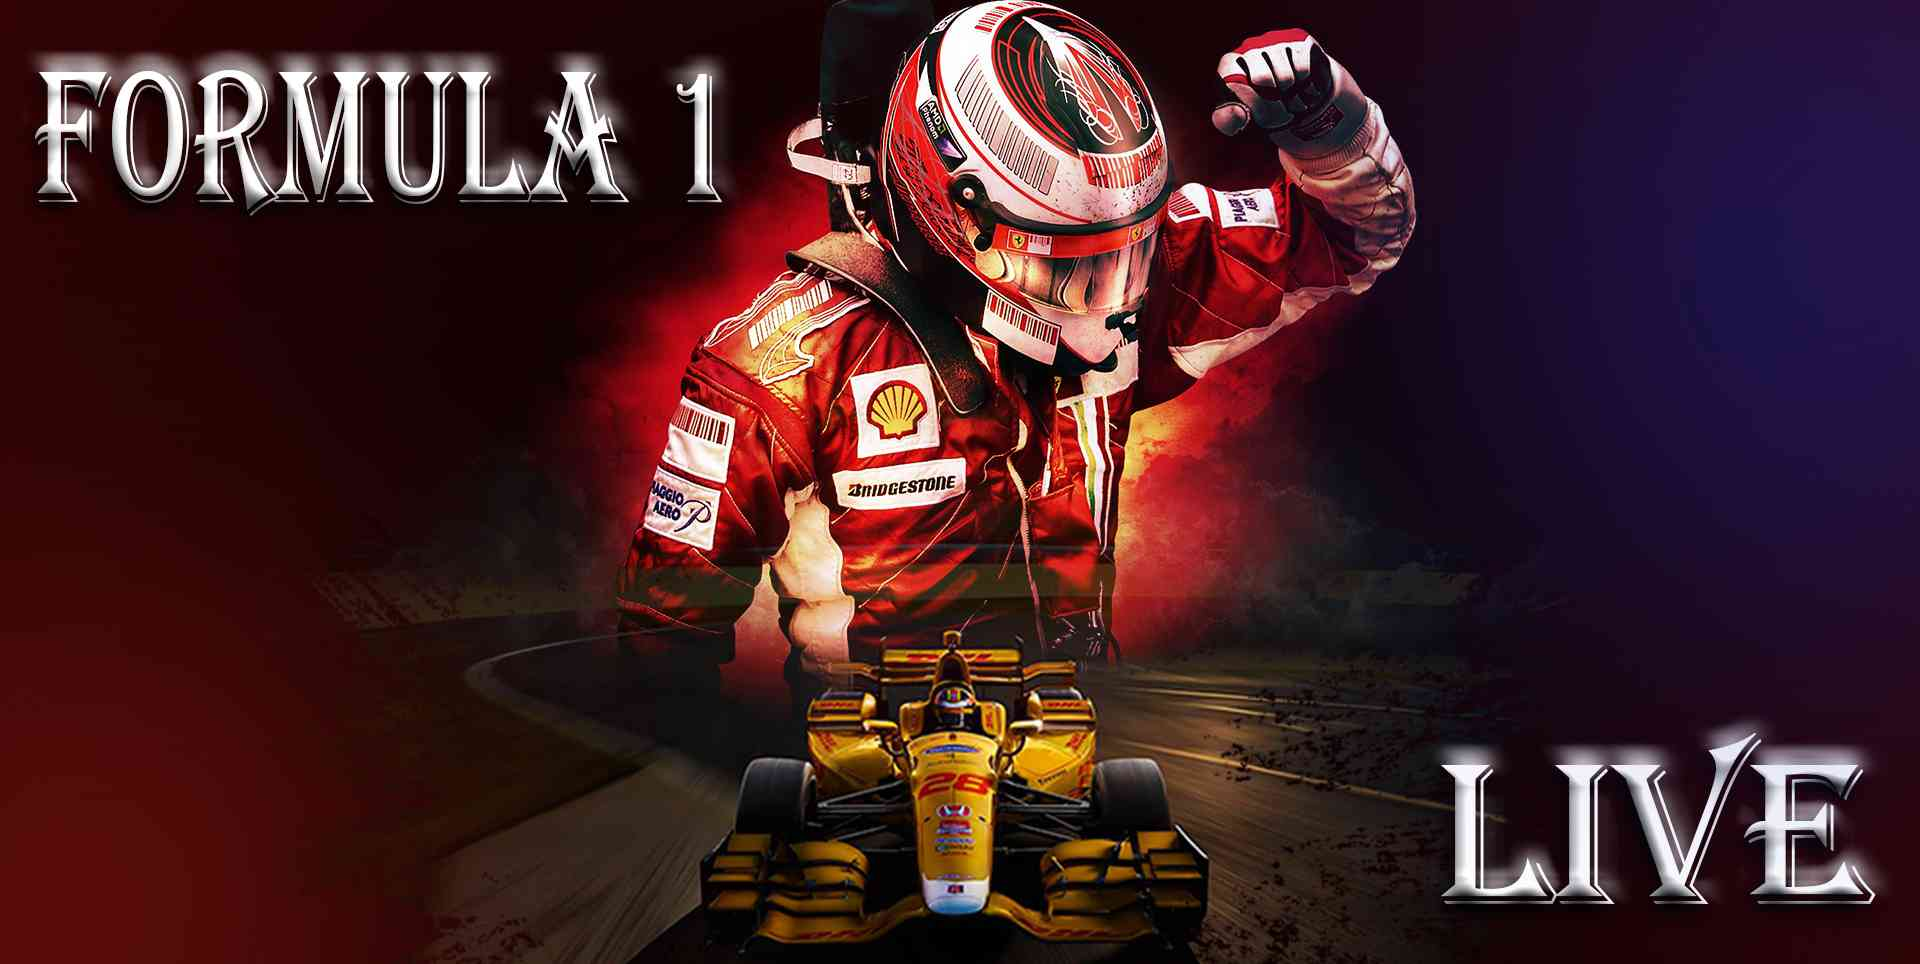 2016 Belgium Formula 1 GP Live Online